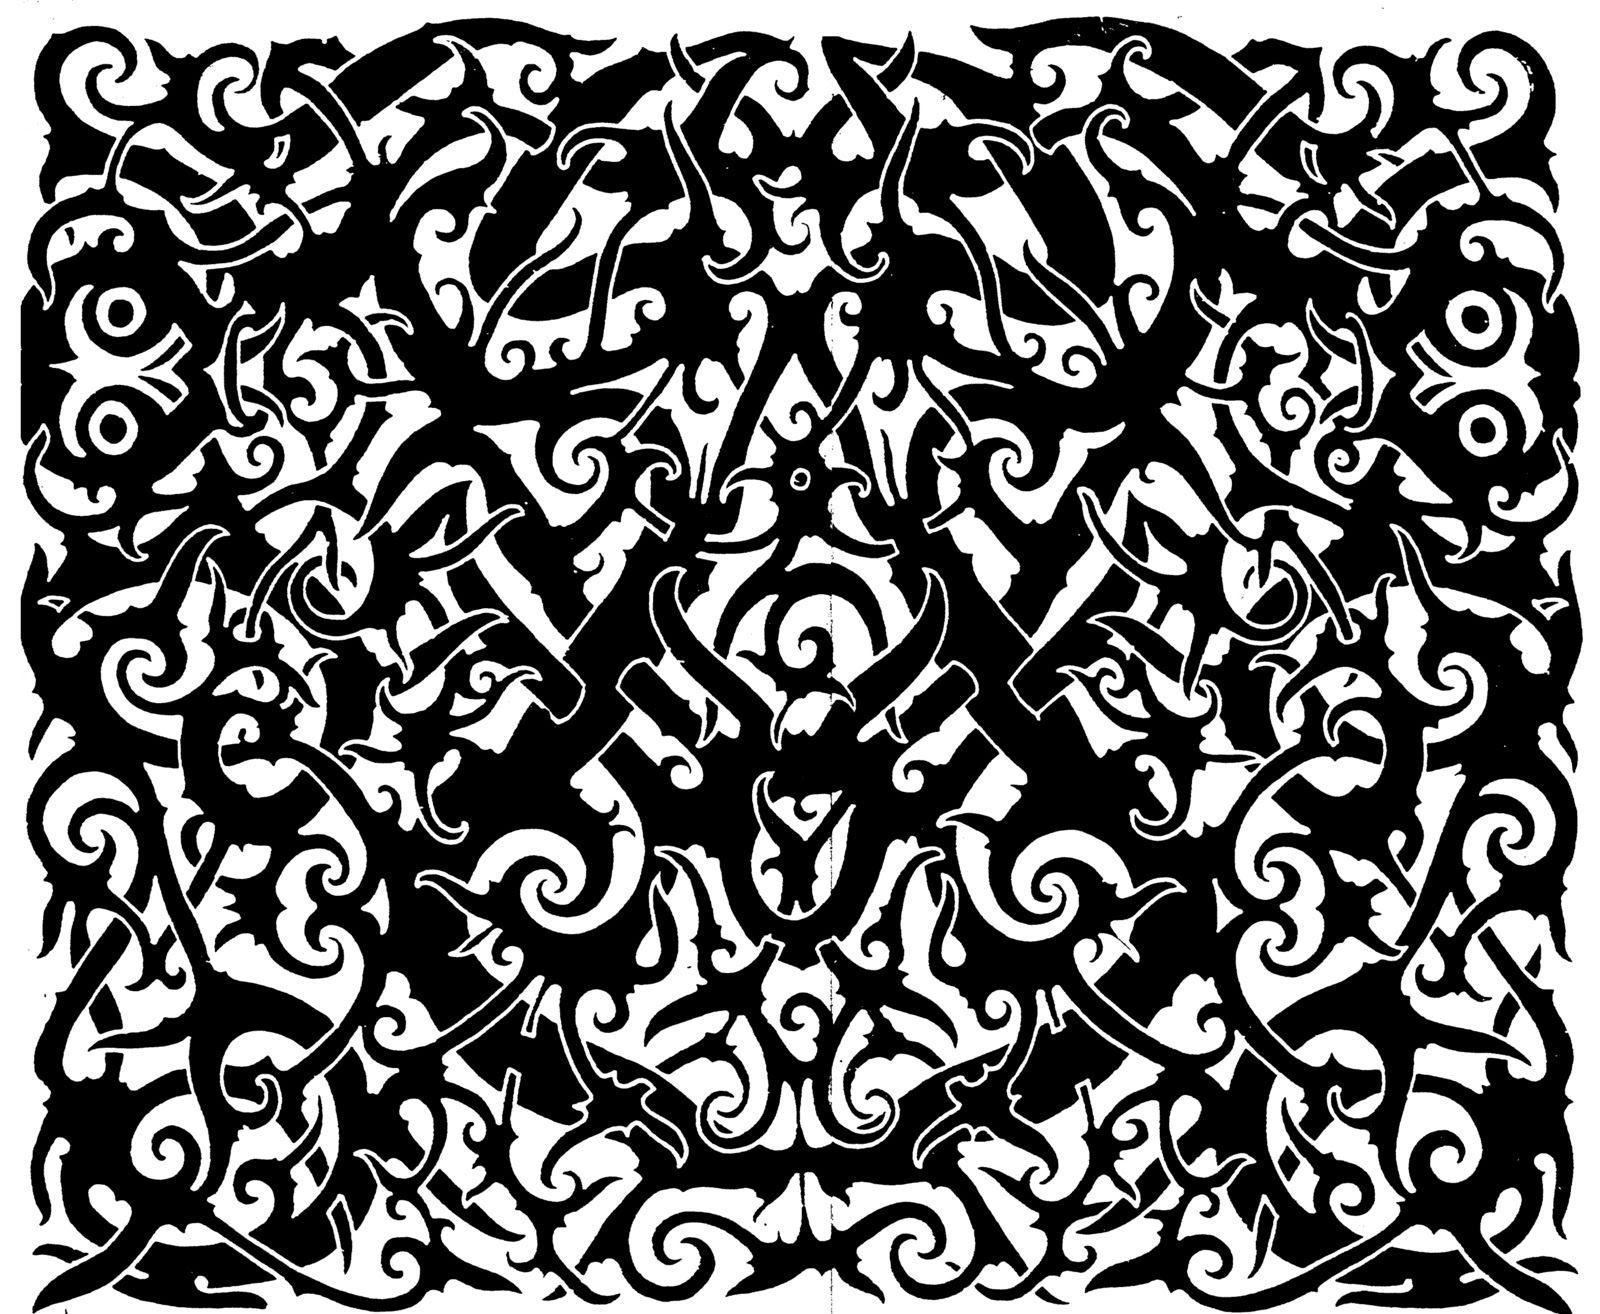 download macam macam motif dayak kalimantan barat tato borneo seni grafis kalimantan download macam macam motif dayak